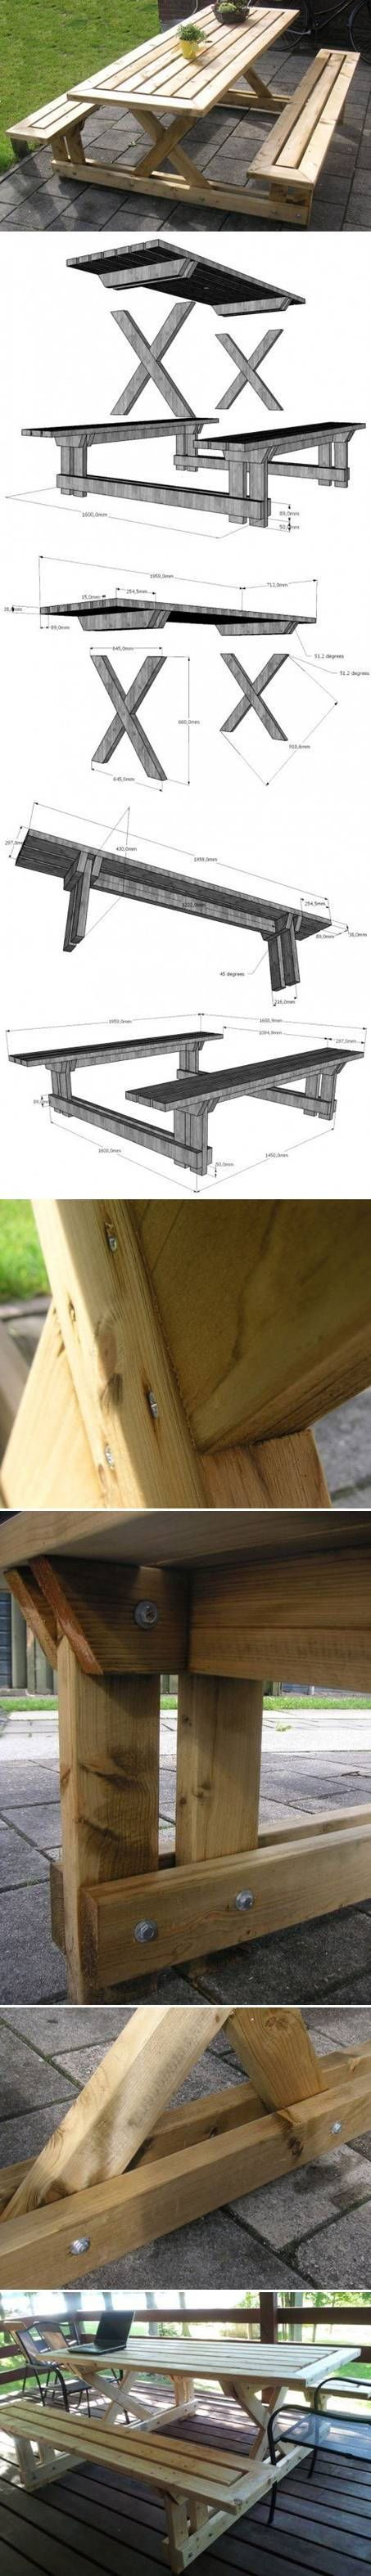 DIY Garden Bench and Table DIY Projects | UsefulDIY.com